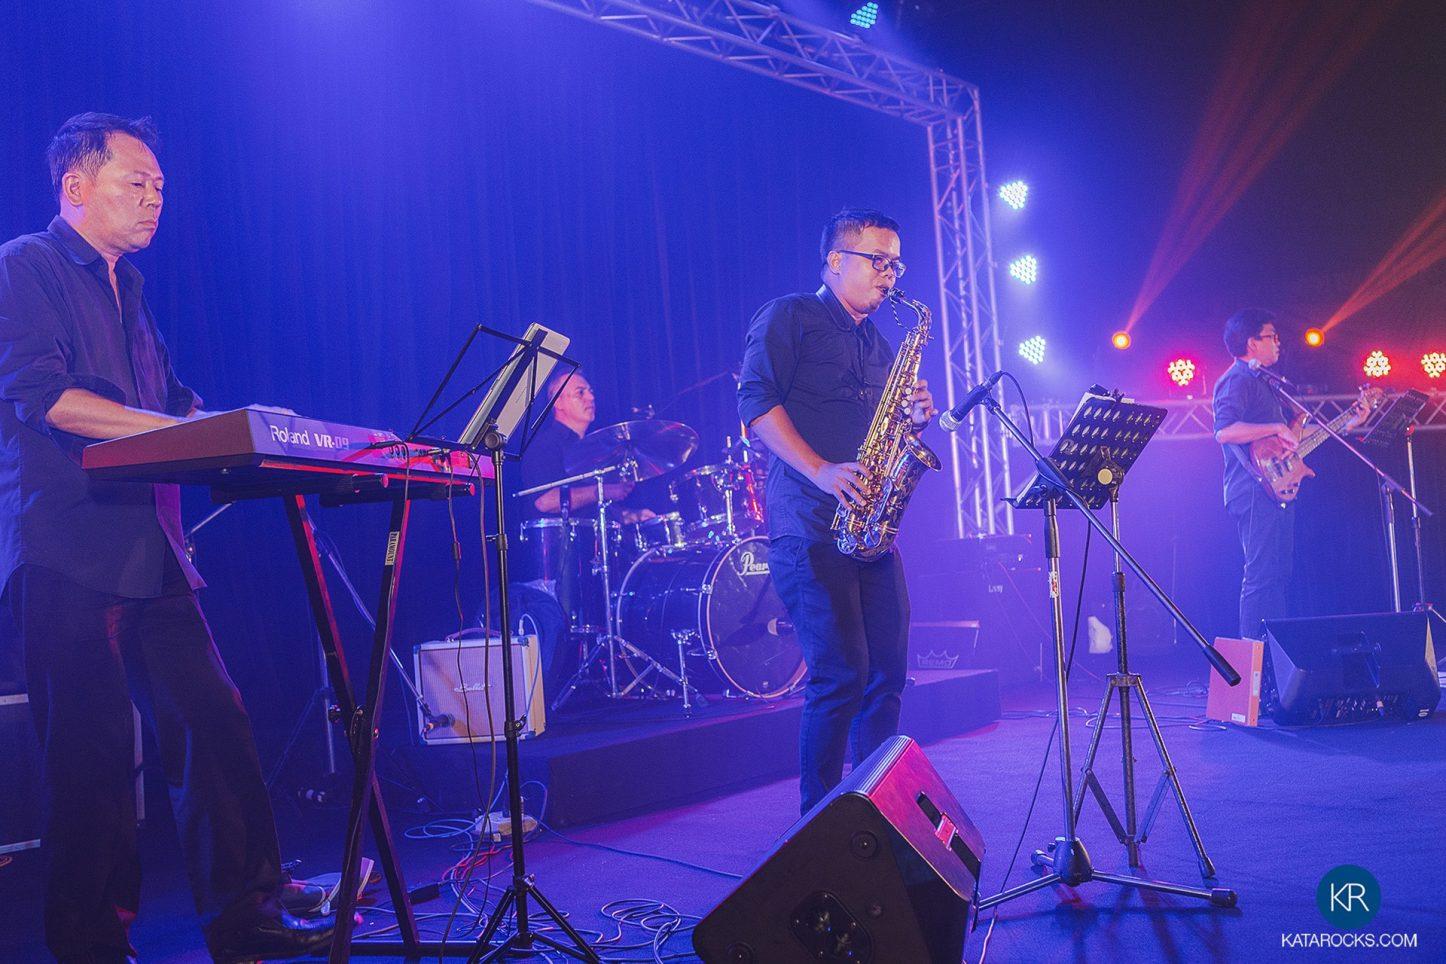 Kata Rocks Pops Up at Phuket Has Been Good to Us - Phuket Charity event music